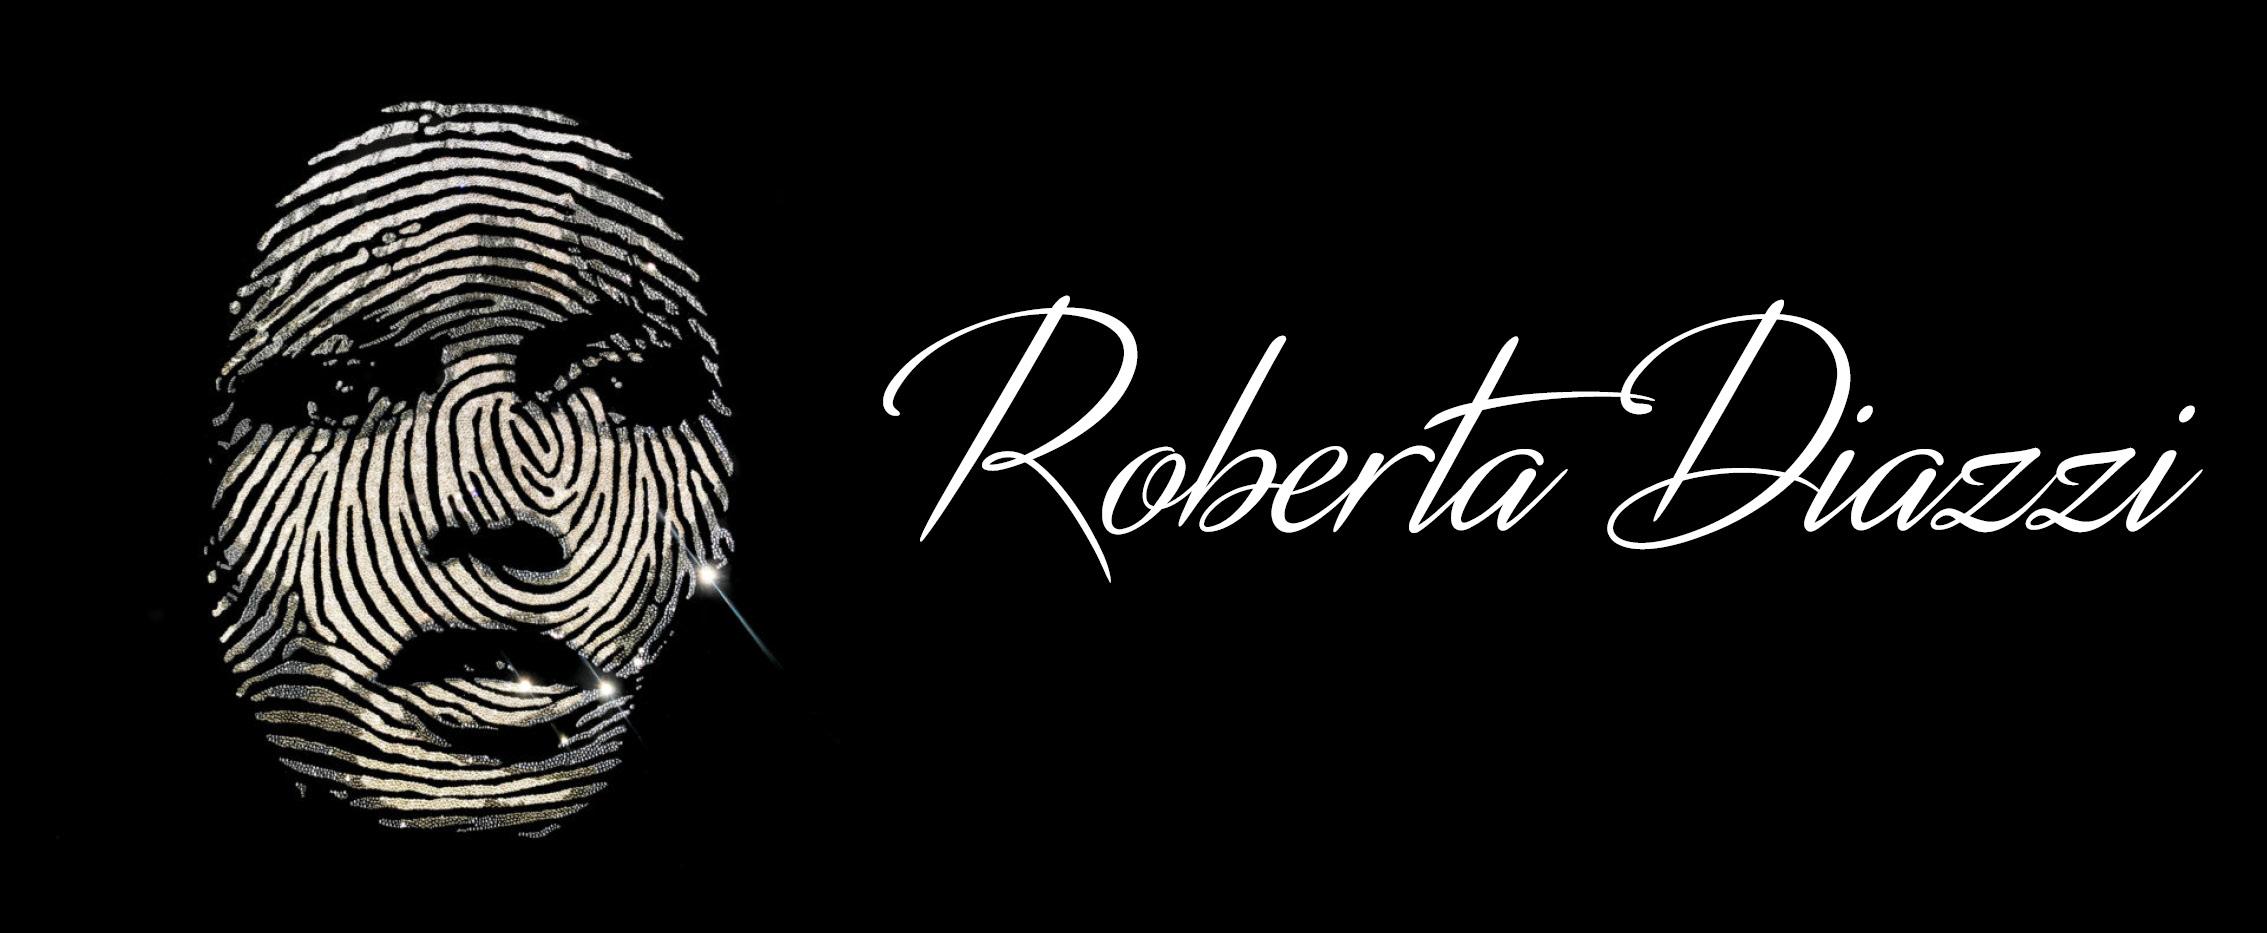 Roberta Diazzi art mediaBook